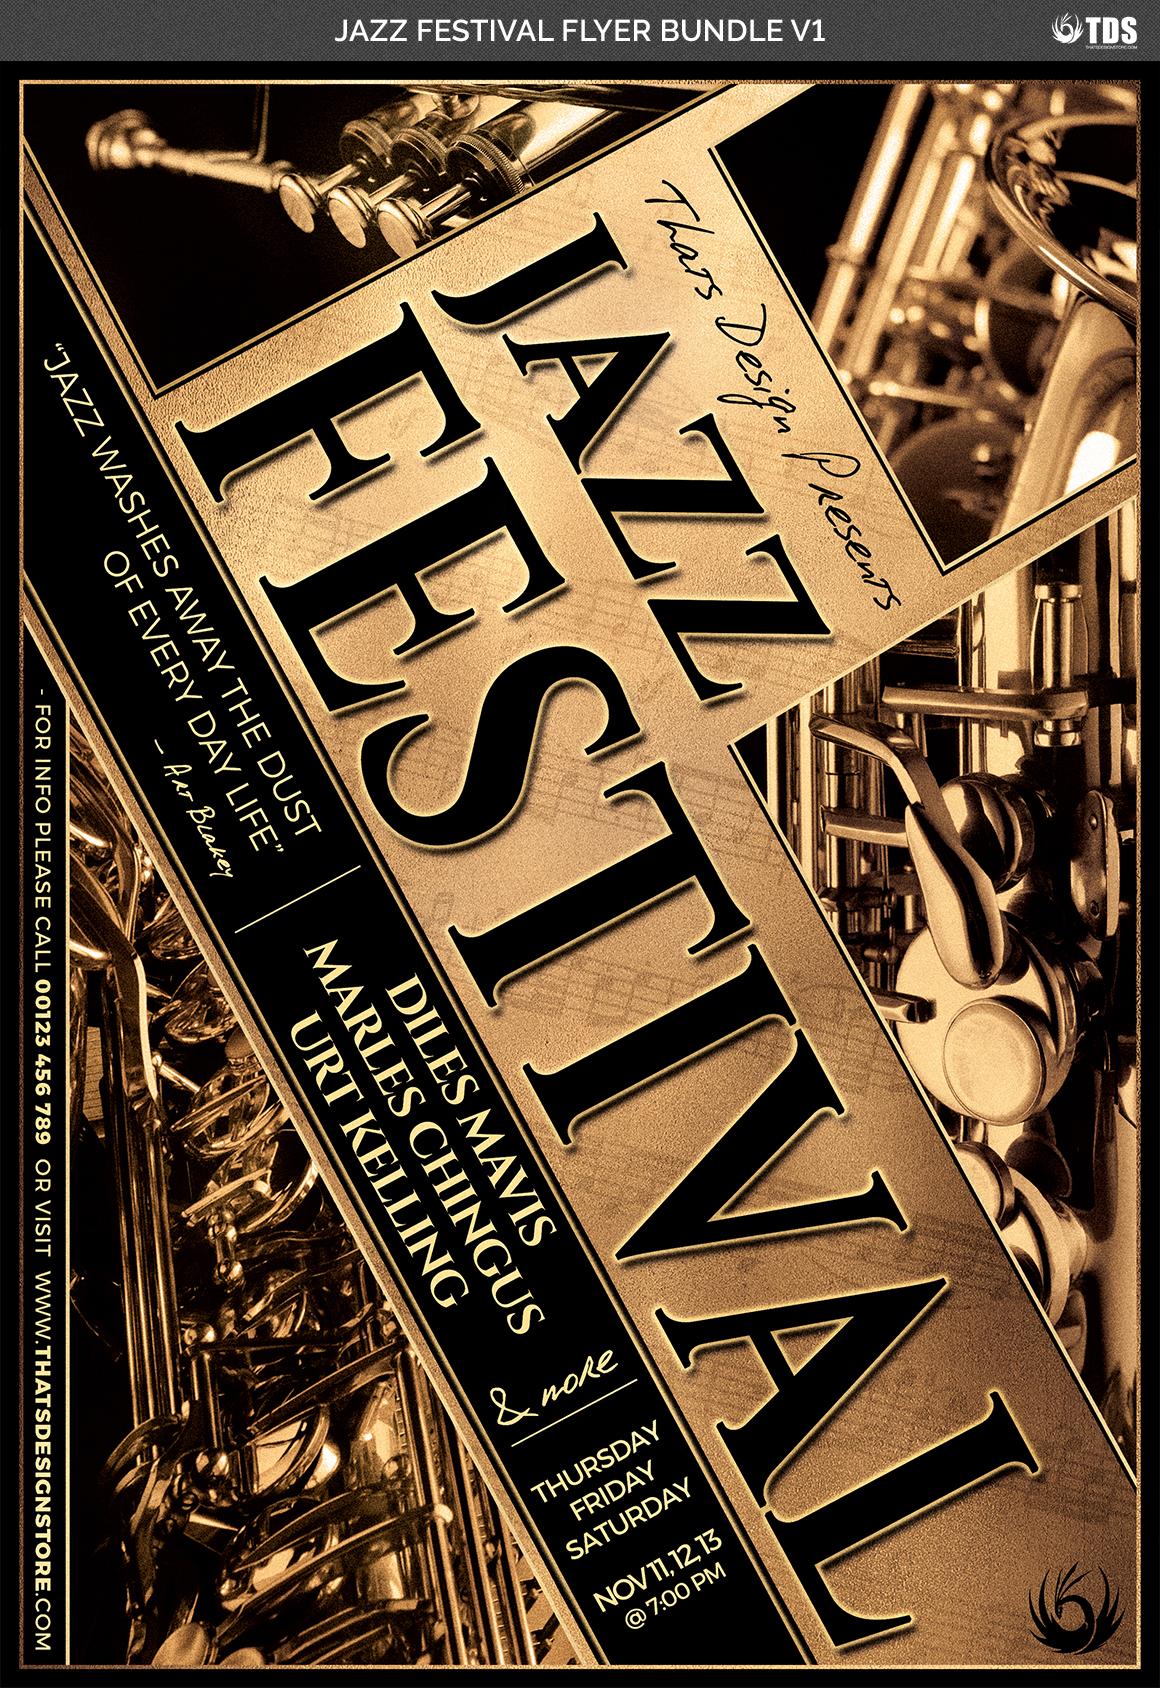 Jazz Festival Flyer Bundle V1 example image 7